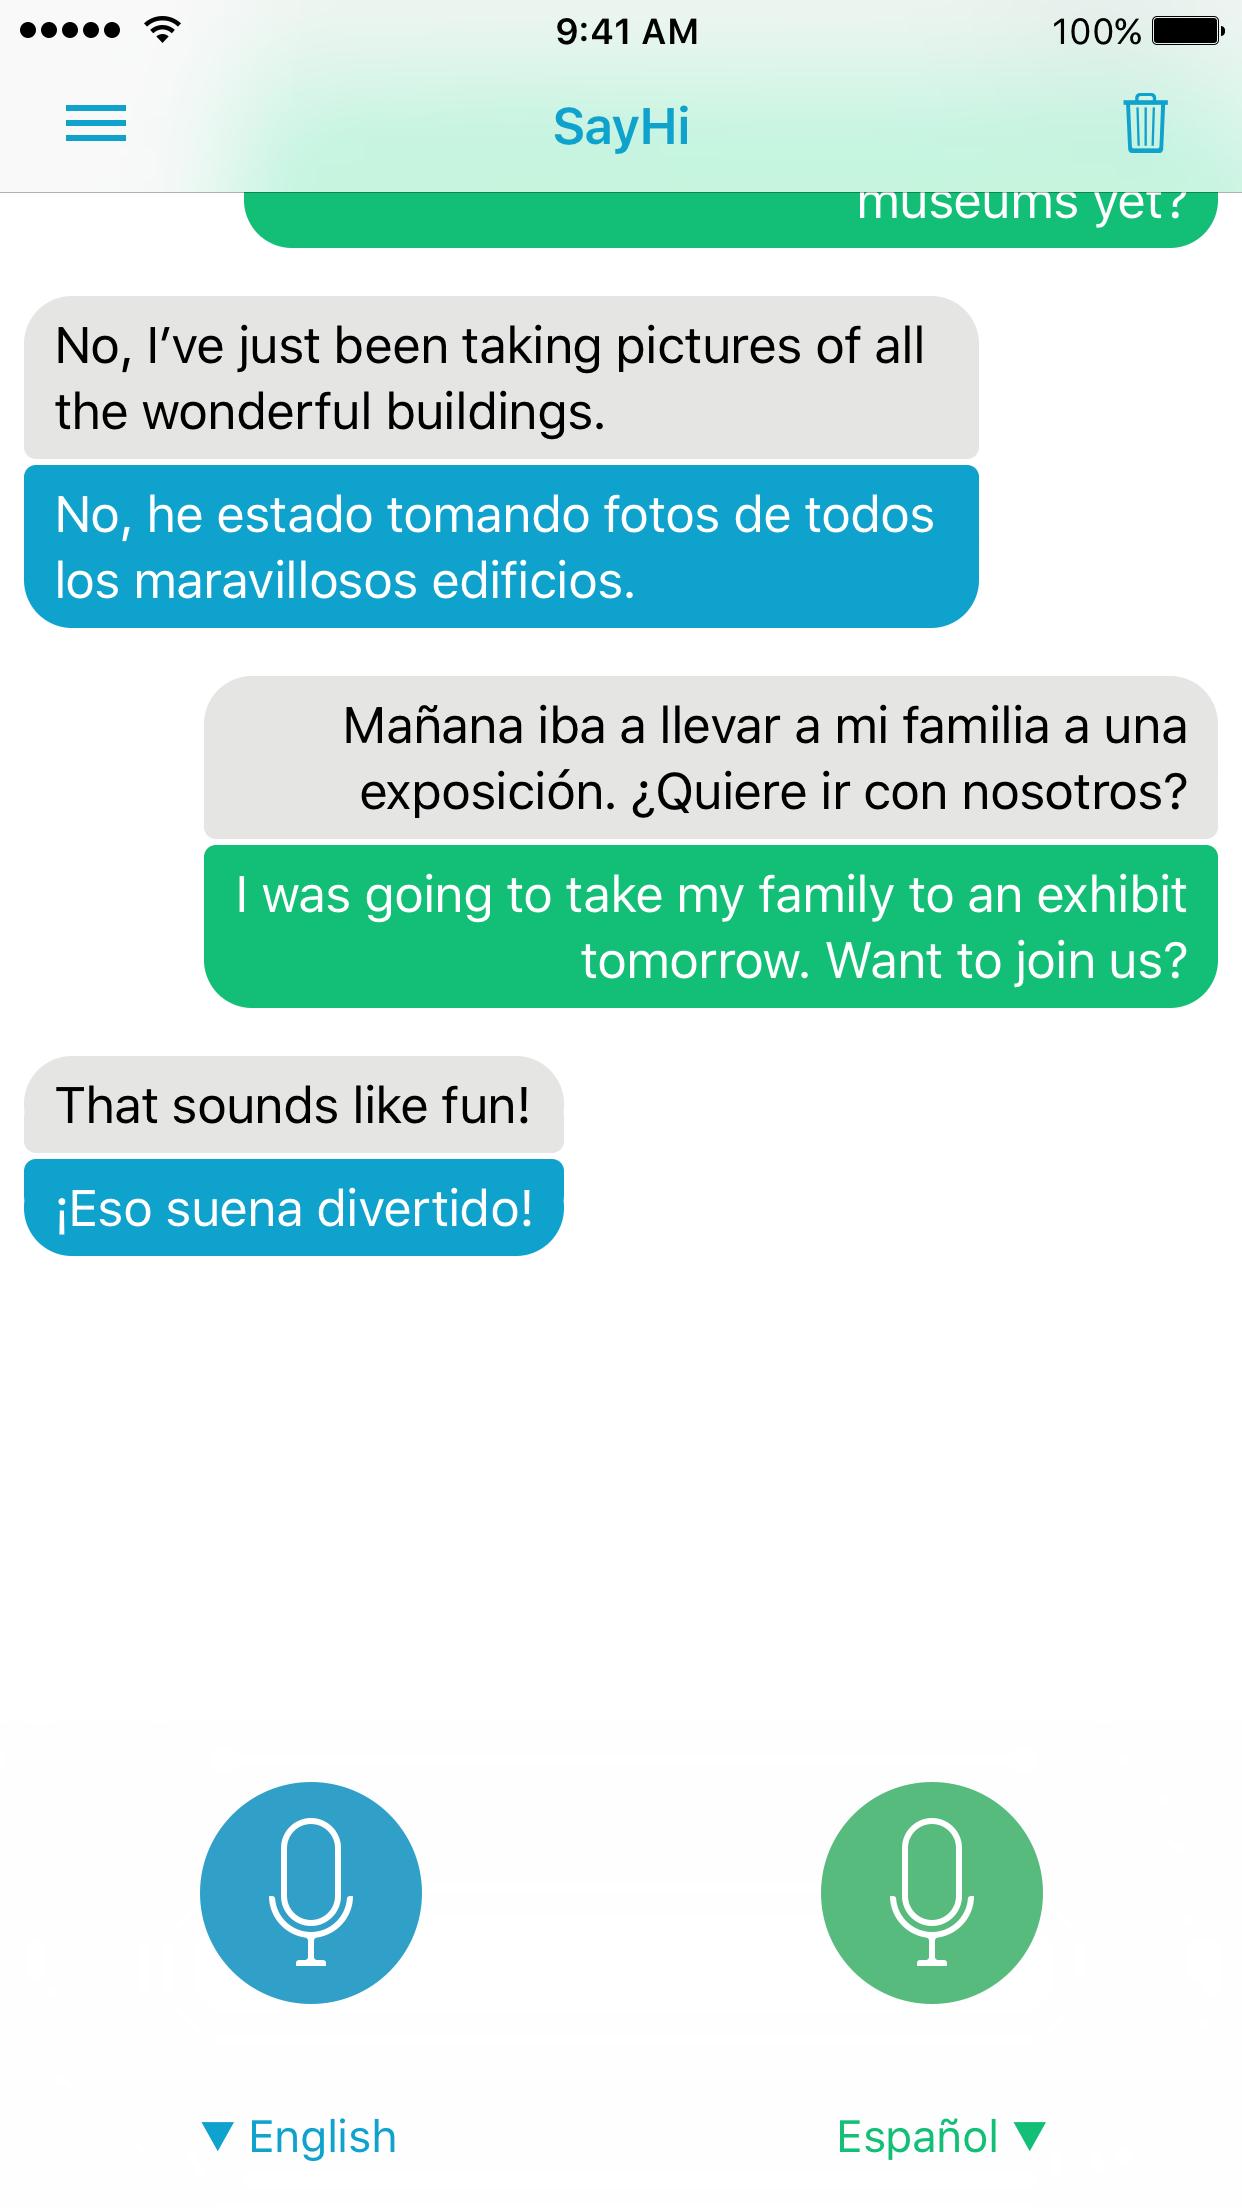 SayHi Translate Screenshot